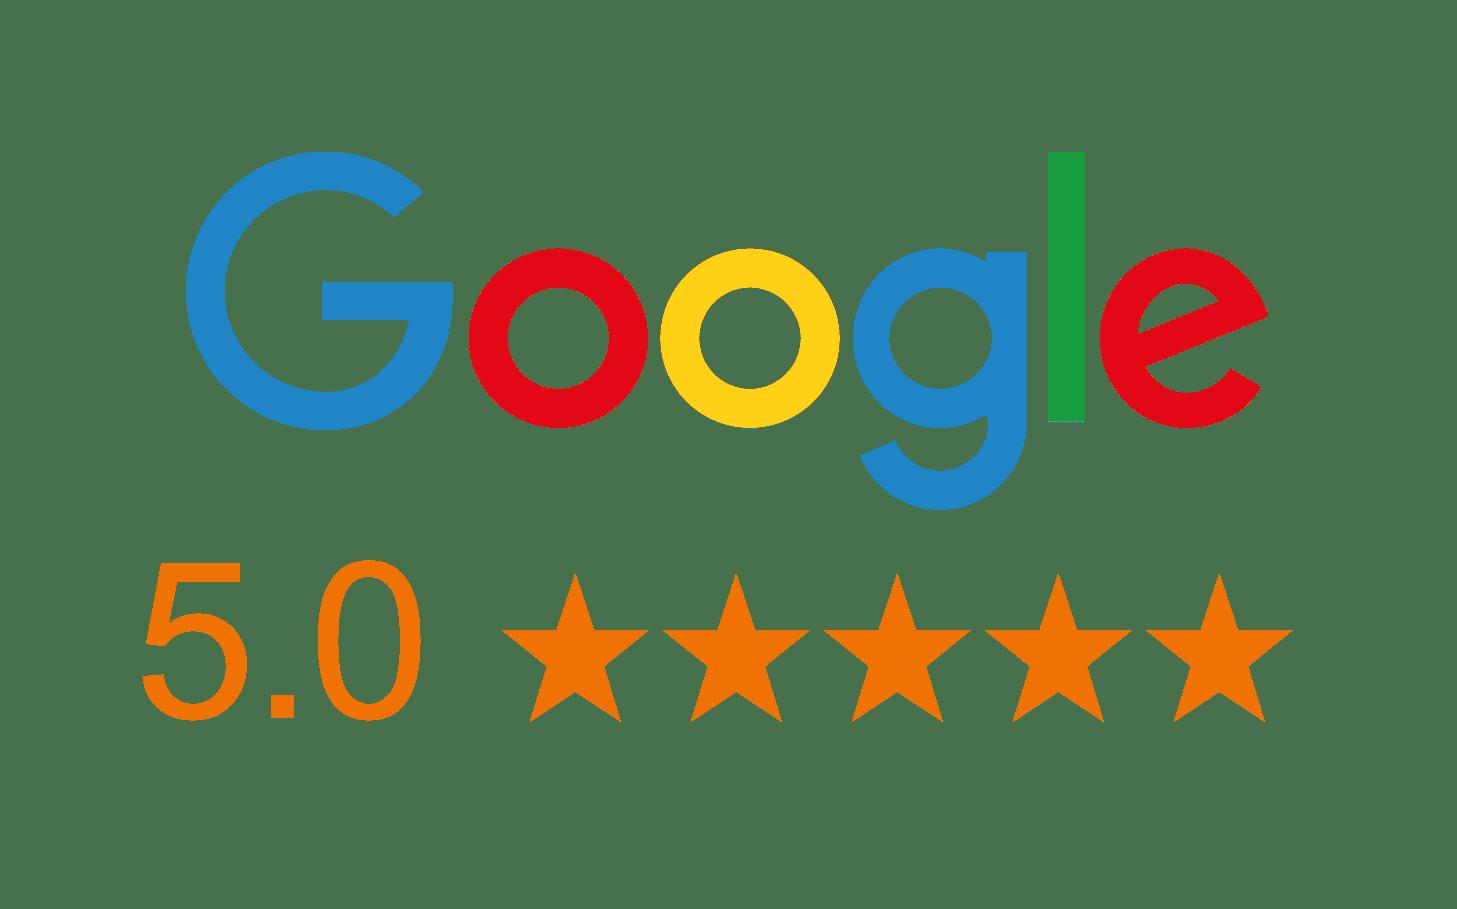 Google 5 Star rating image